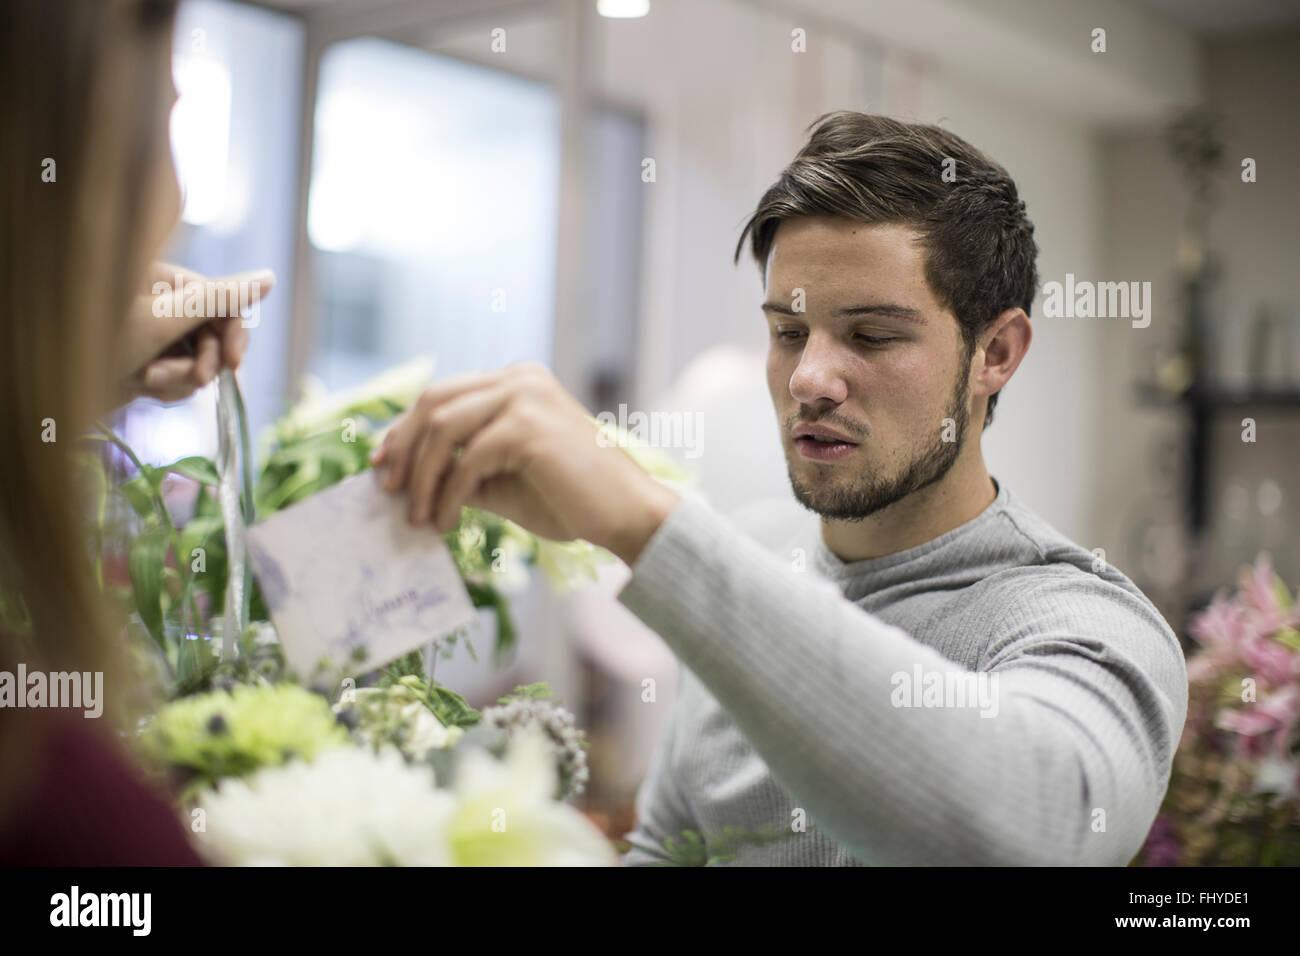 Man putting greeting card in flower arrangement - Stock Image